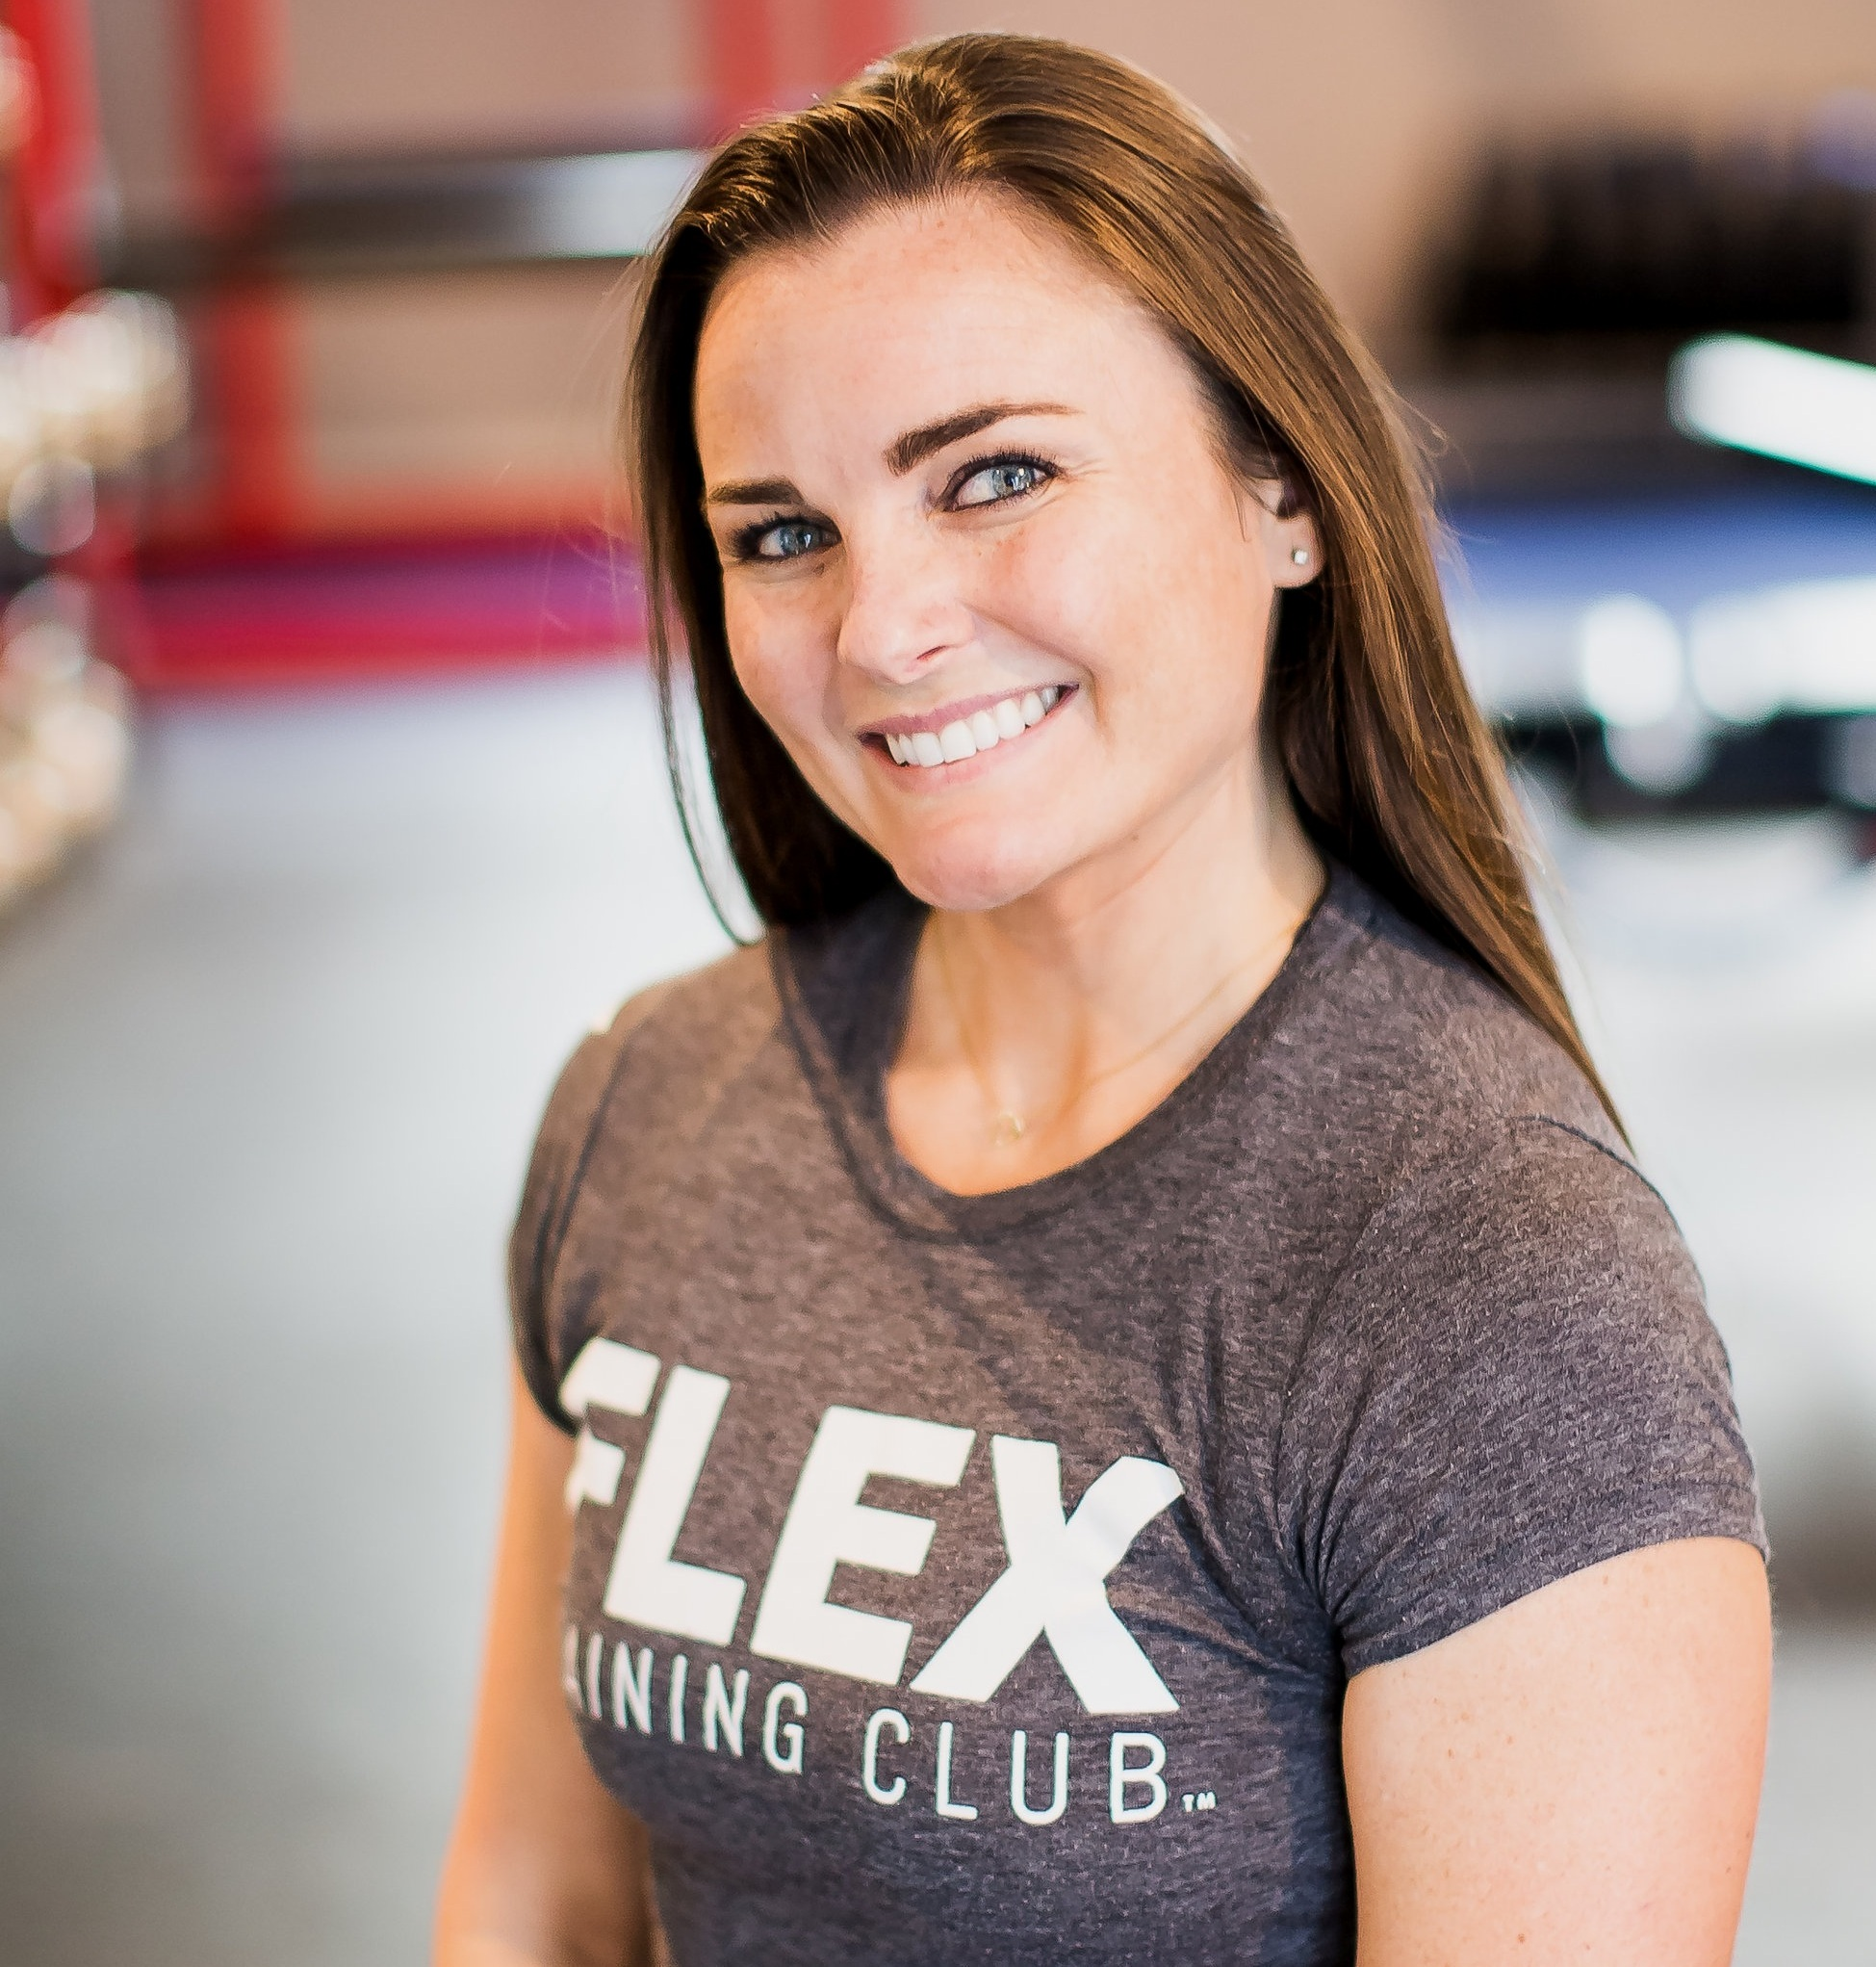 KATIE DAWSON - NASM Certified Personal Trainer, Fitness Nutrition Specialist, Women's Fitness Specialist